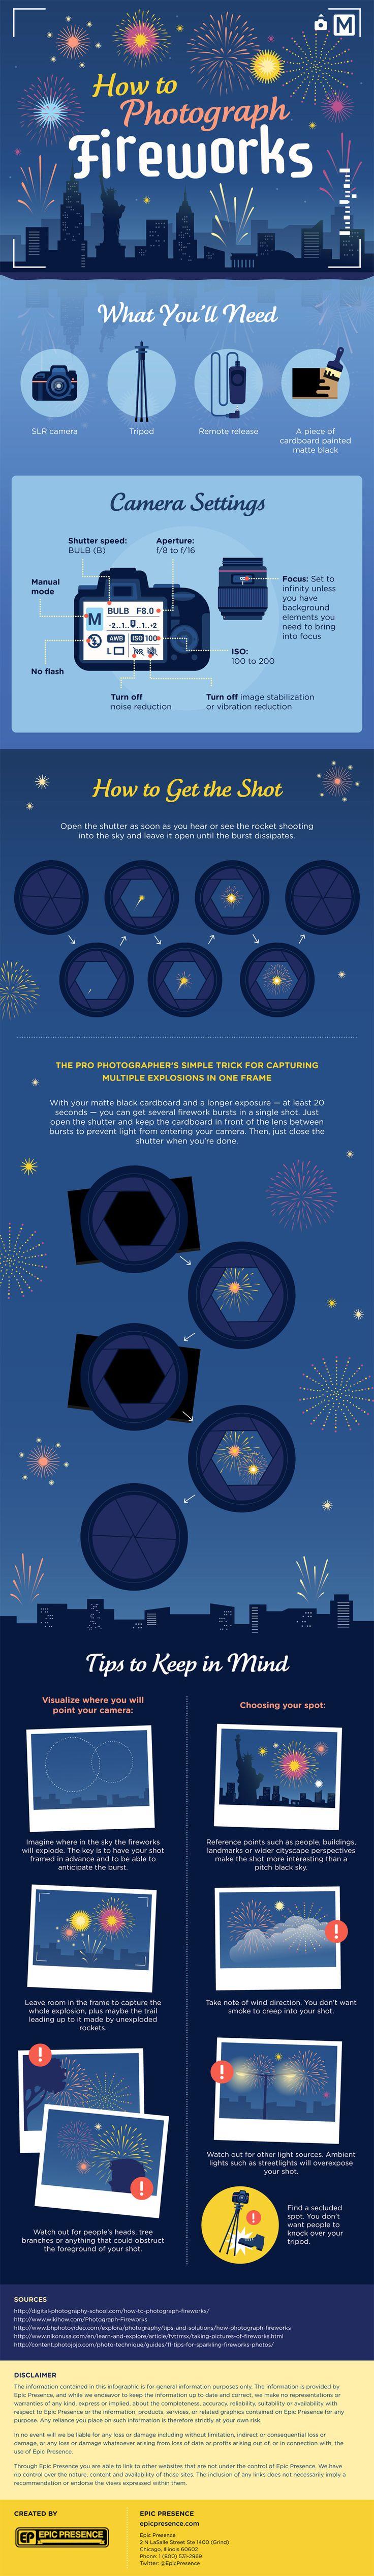 best 25 pics of fireworks ideas on pinterest night wedding